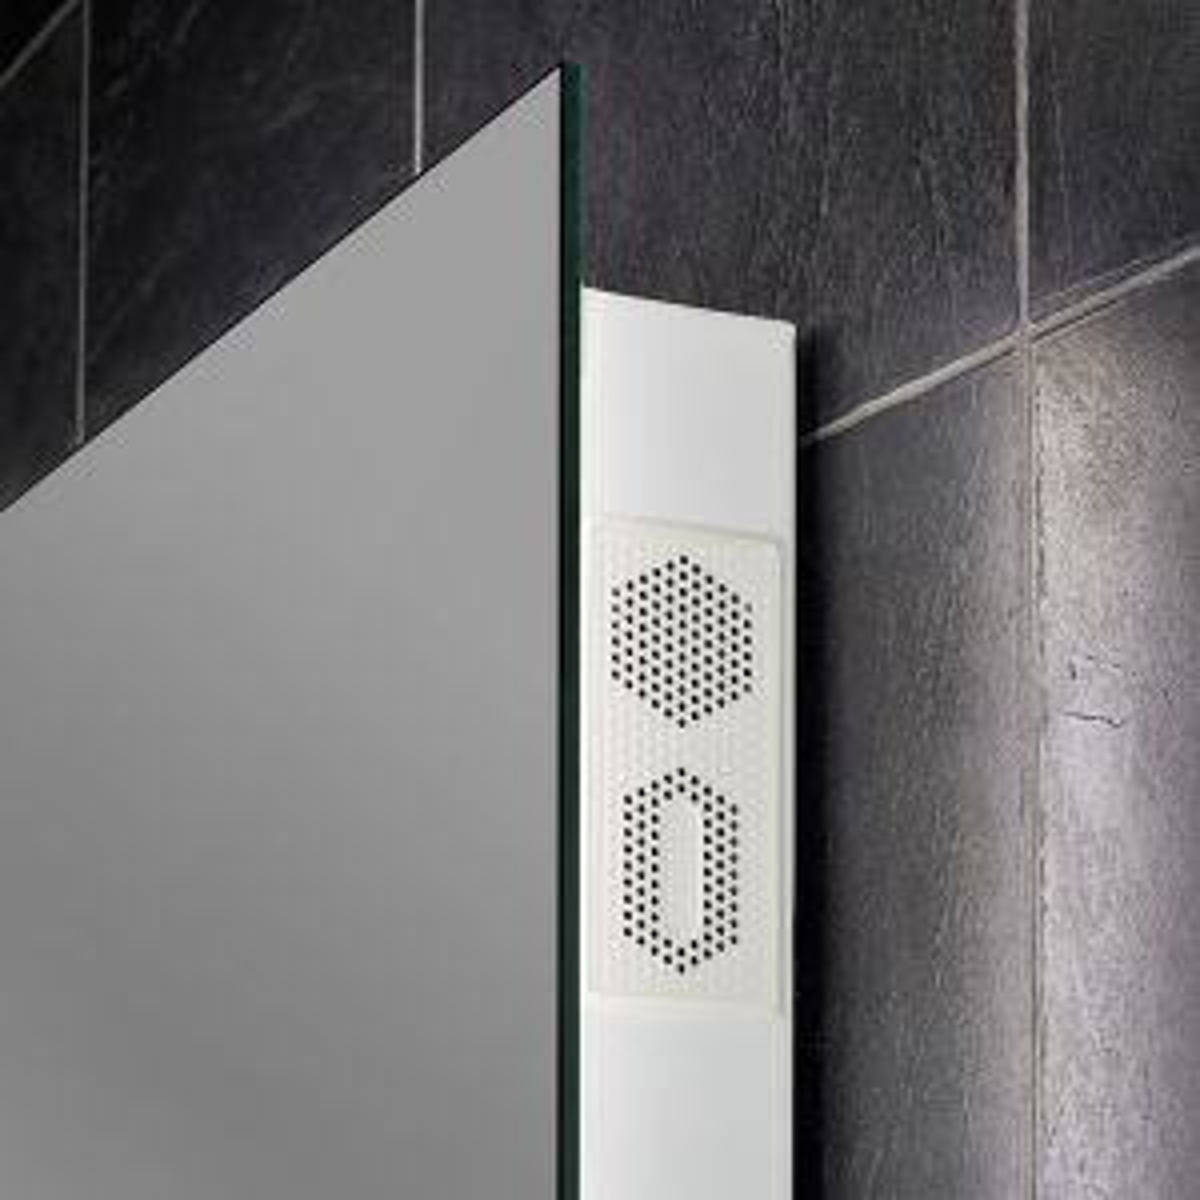 Sensio Avalon Bluetooth Backlit LED mirror 2